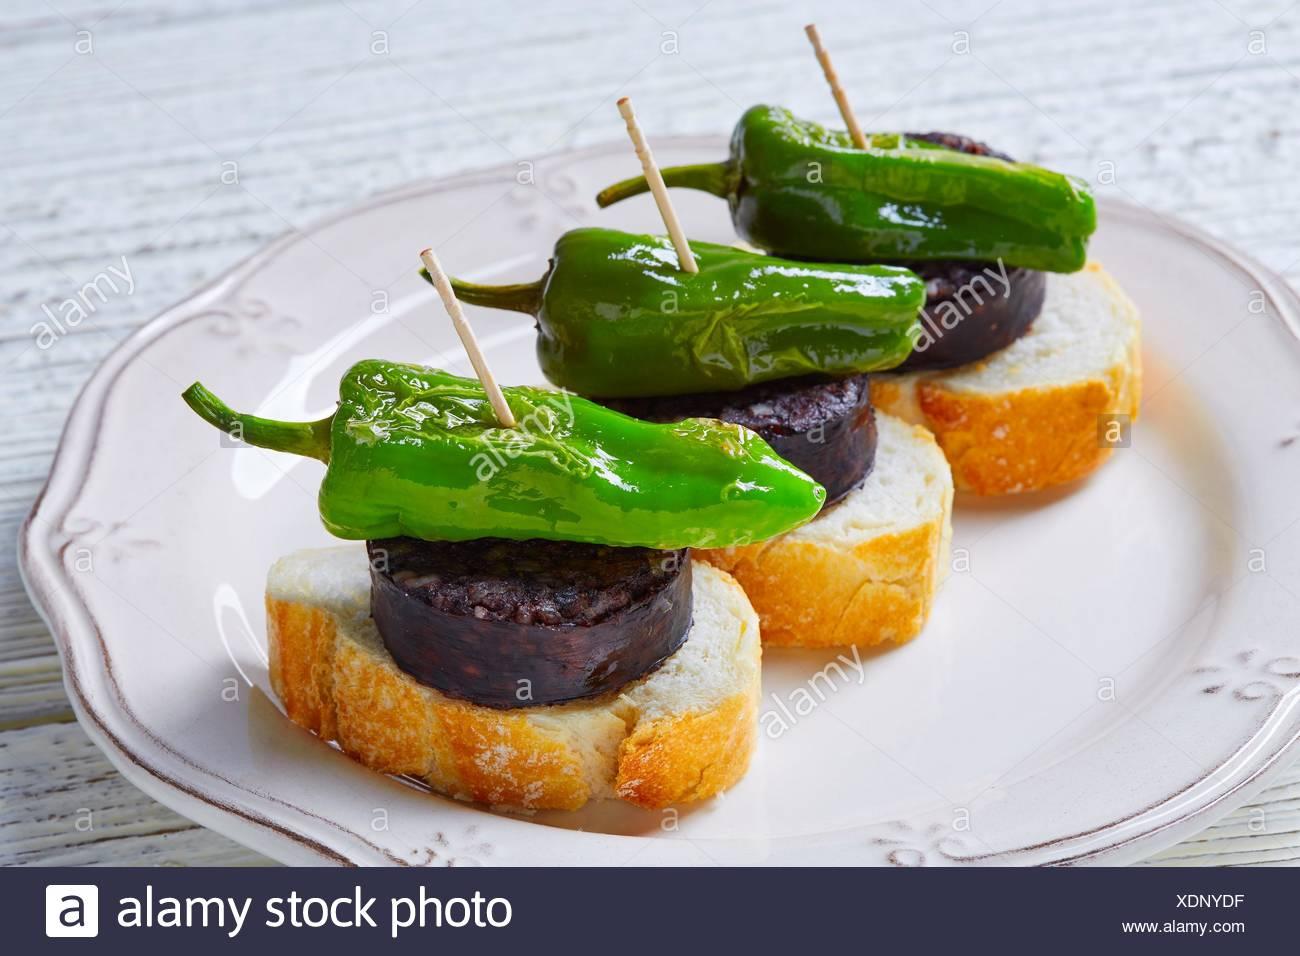 pinchos Burgos morcilla with padron pepper tapas pintxos from Spain food. - Stock Image